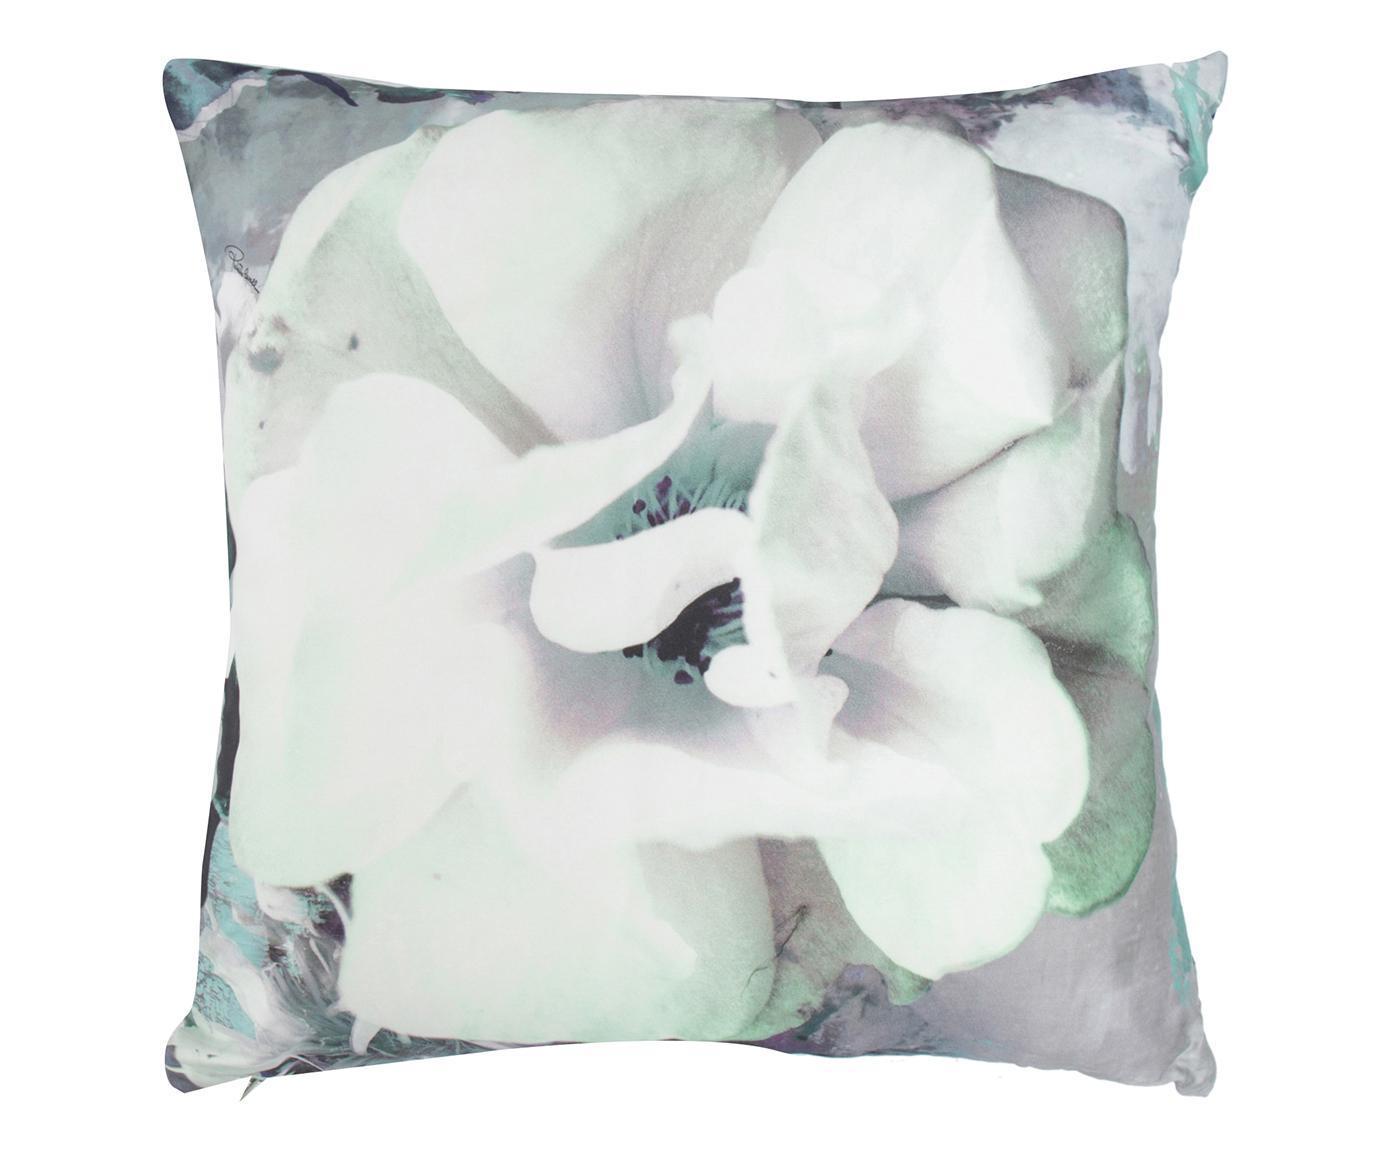 Cuscino arredo in seta Dark Flower acqua, 60x60 cm